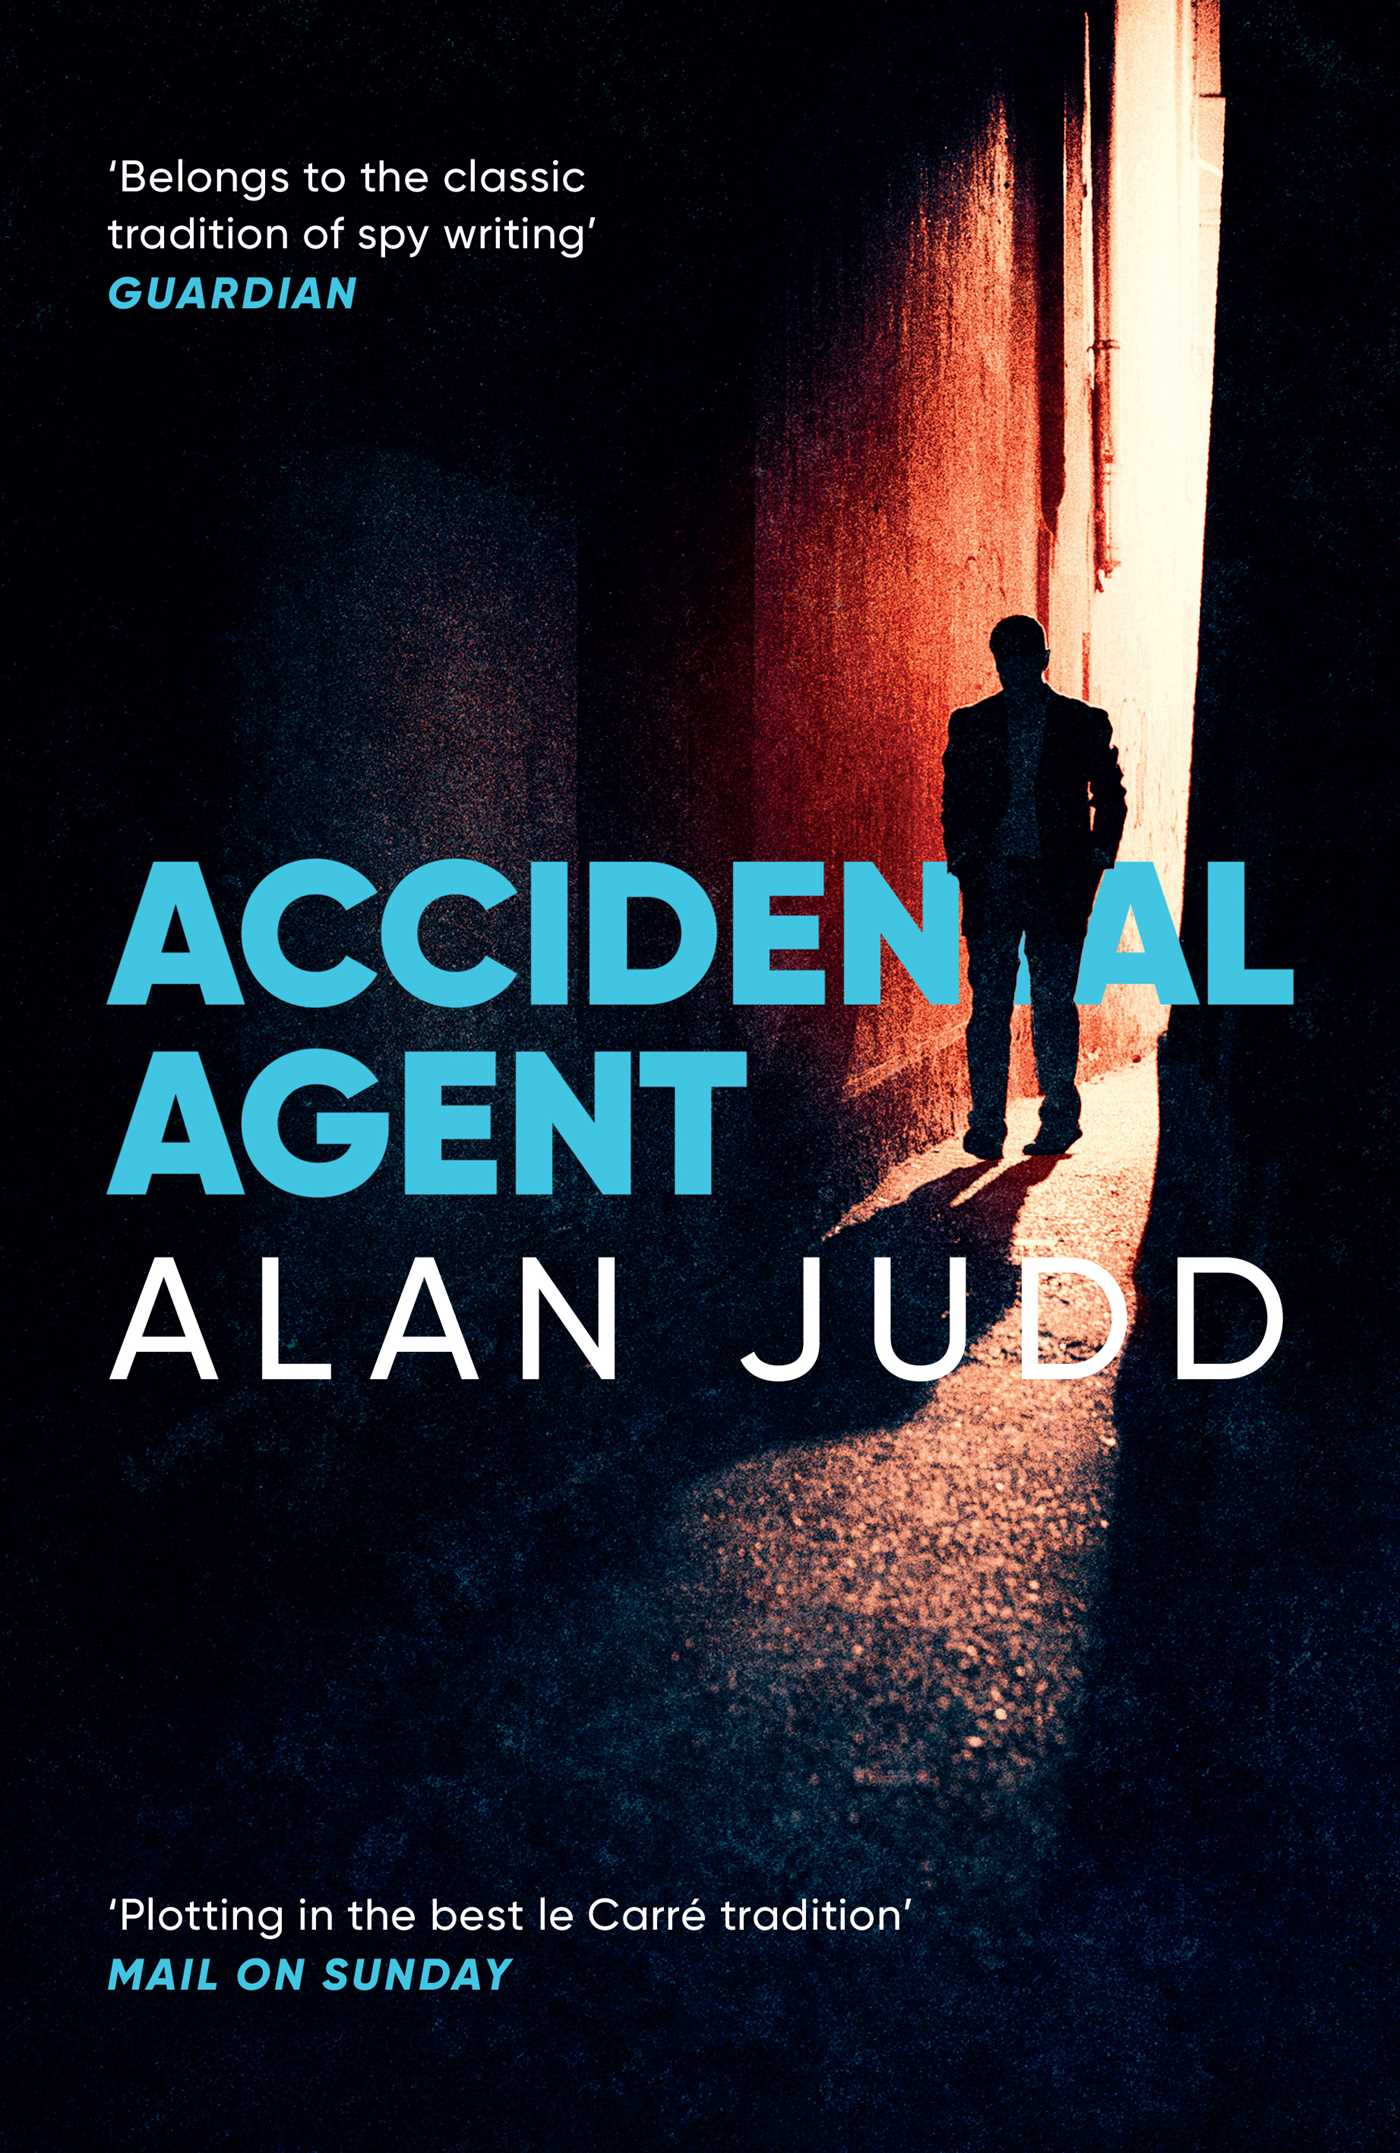 Accidental agent 9781471150678 hr